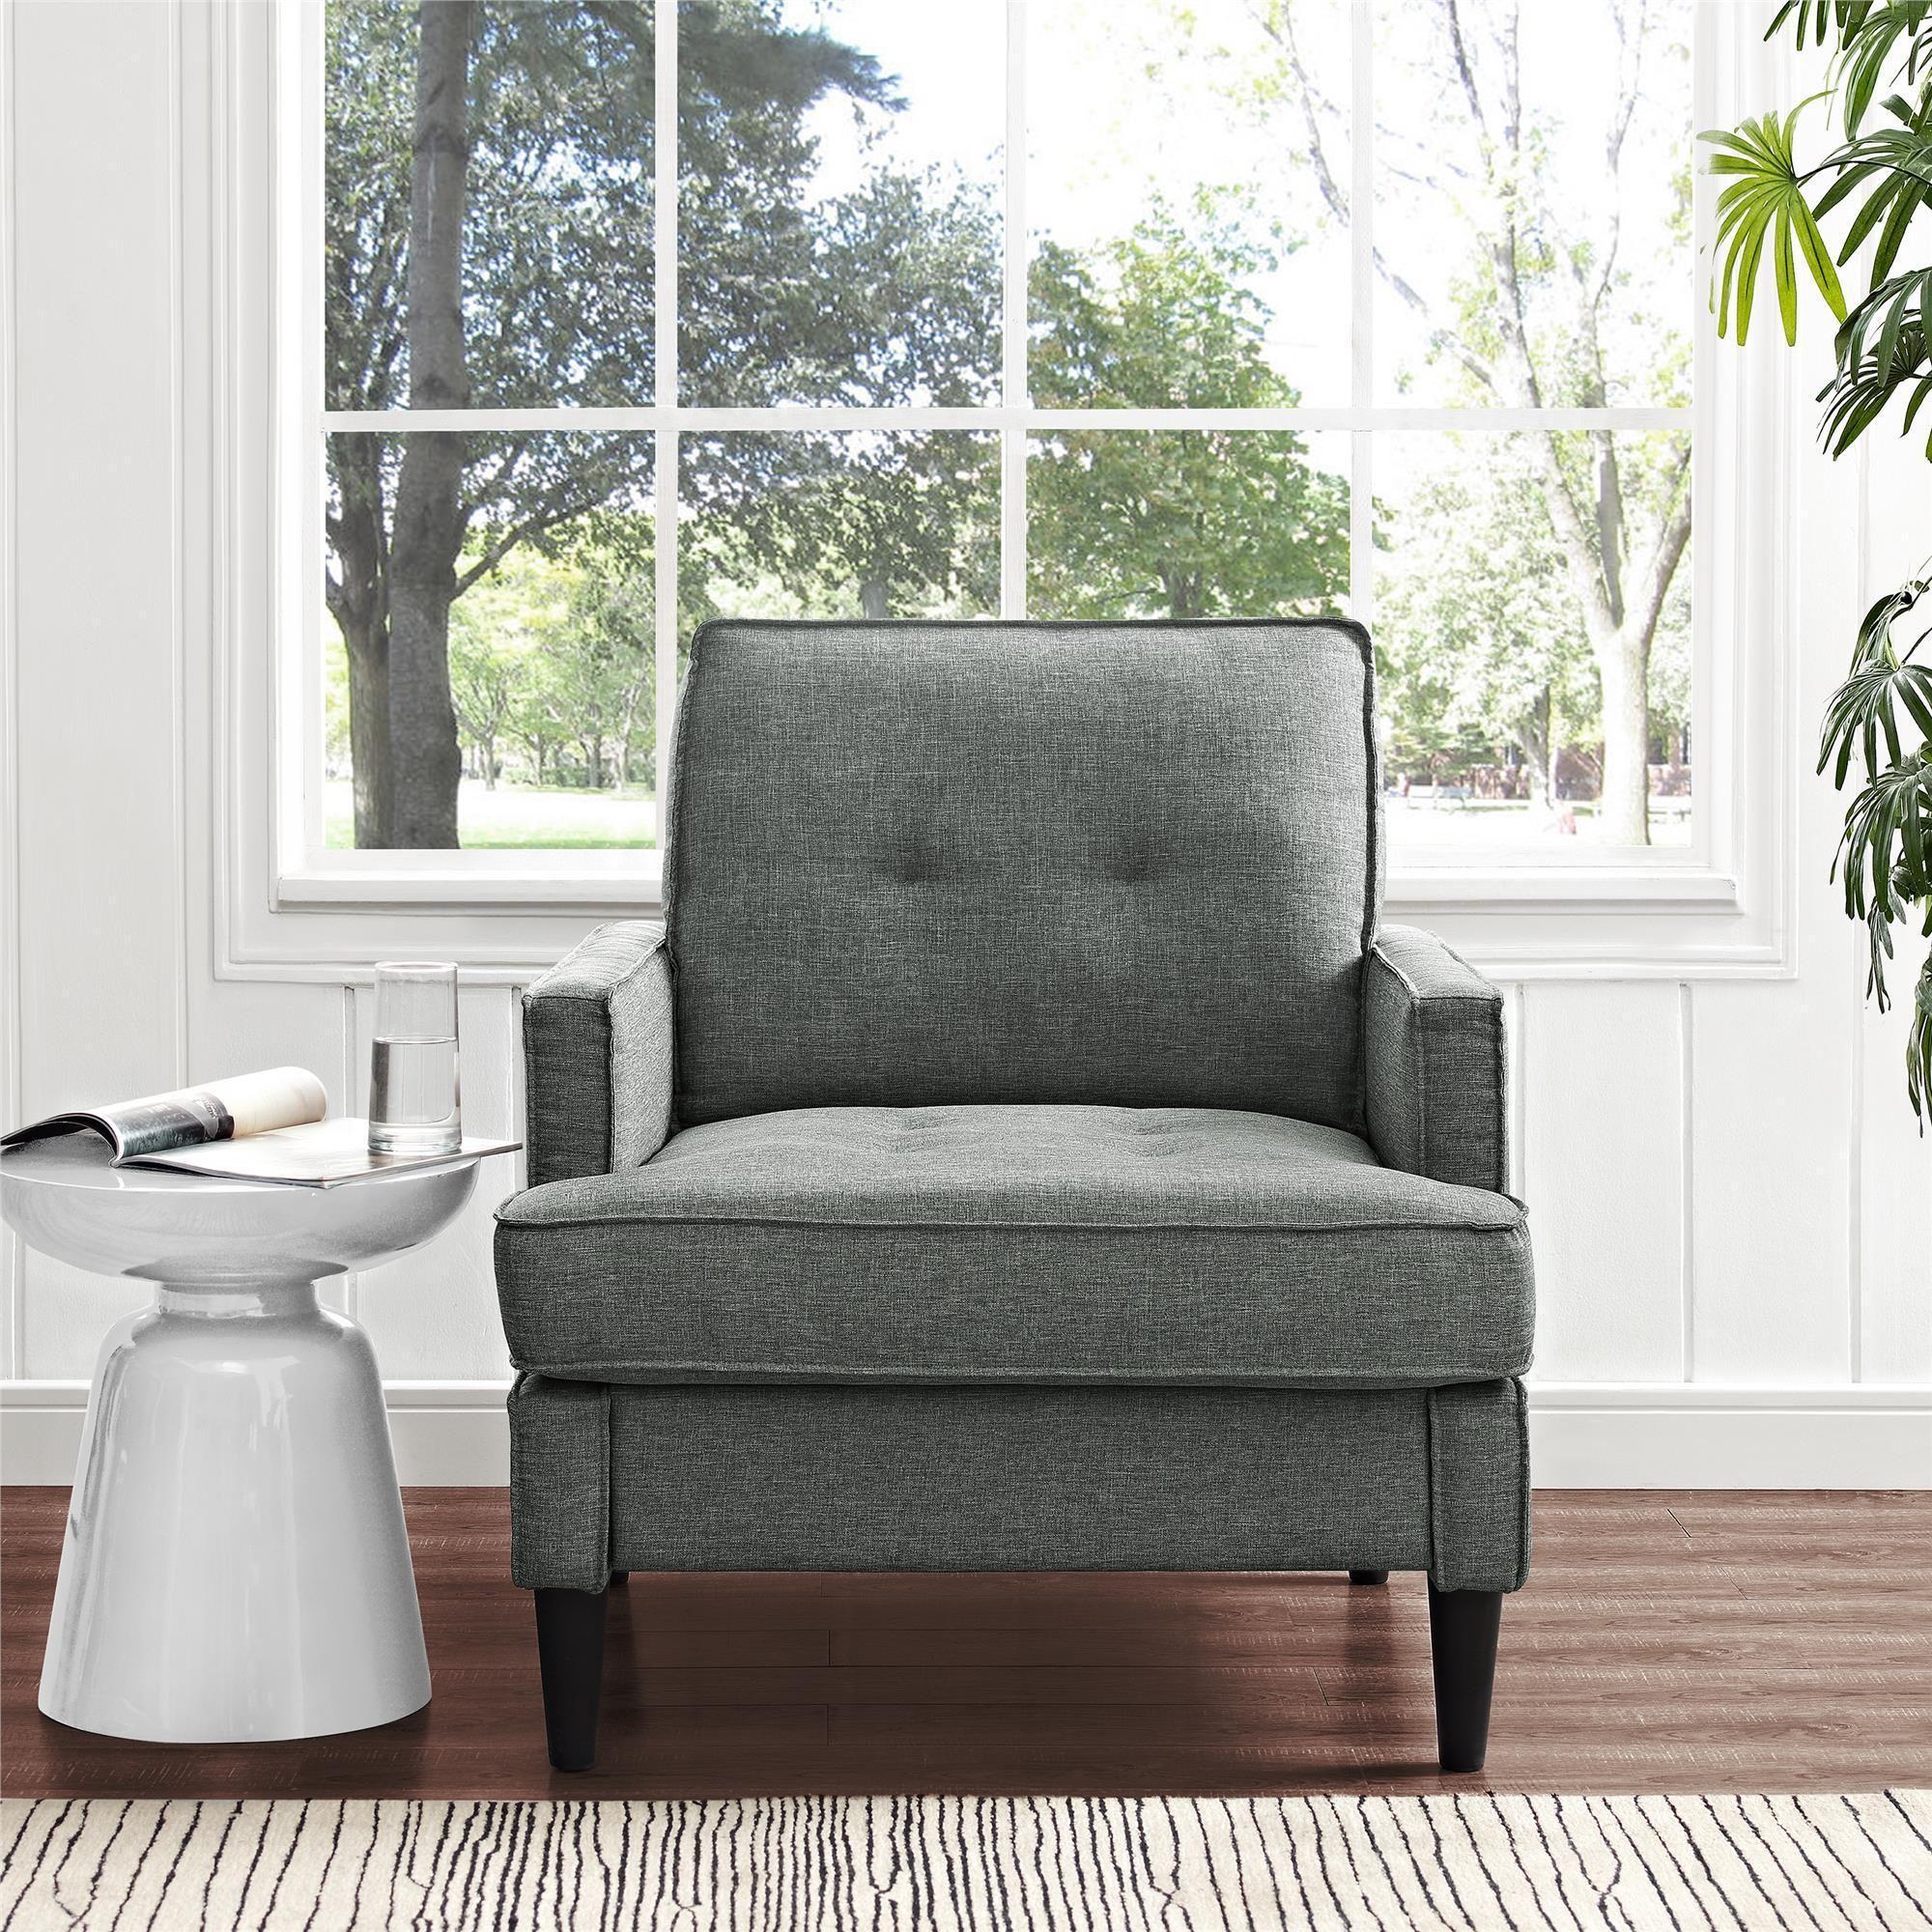 Dorel Living Marley Chair